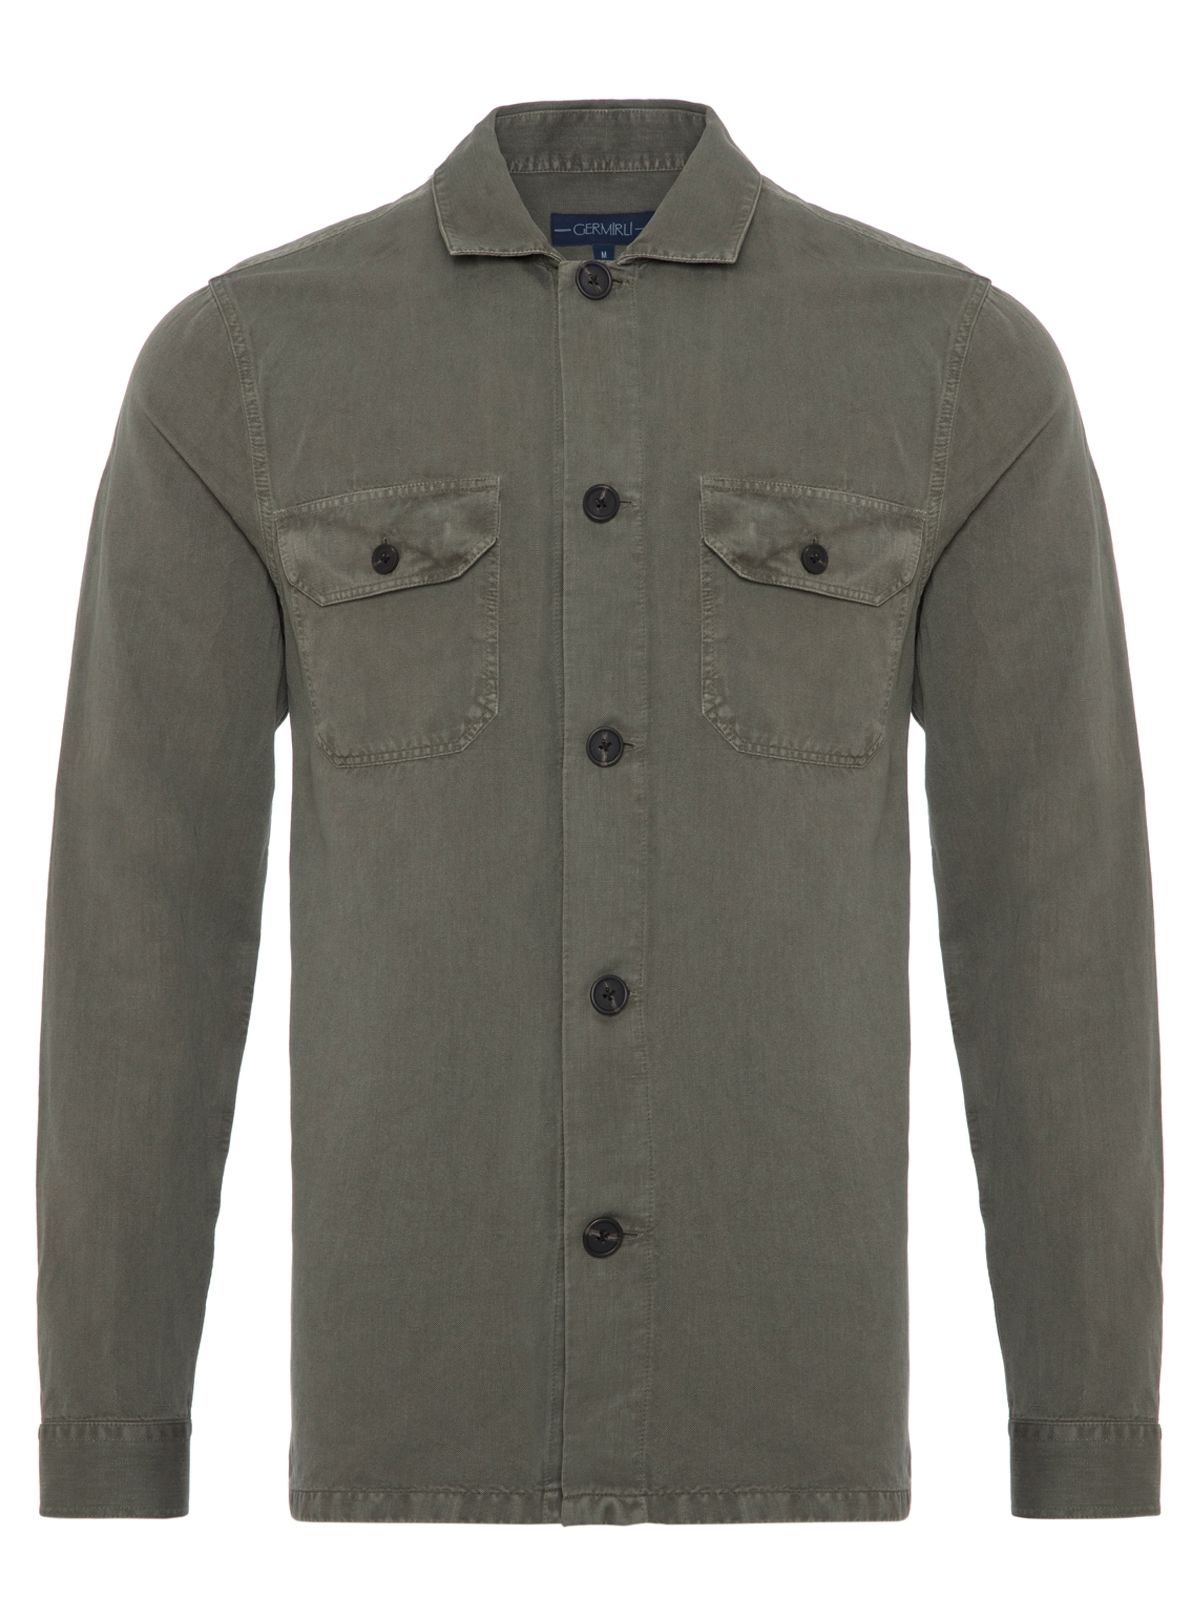 Germirli Yeşil Vintage Keten Tailor Fit Ceket Gömlek